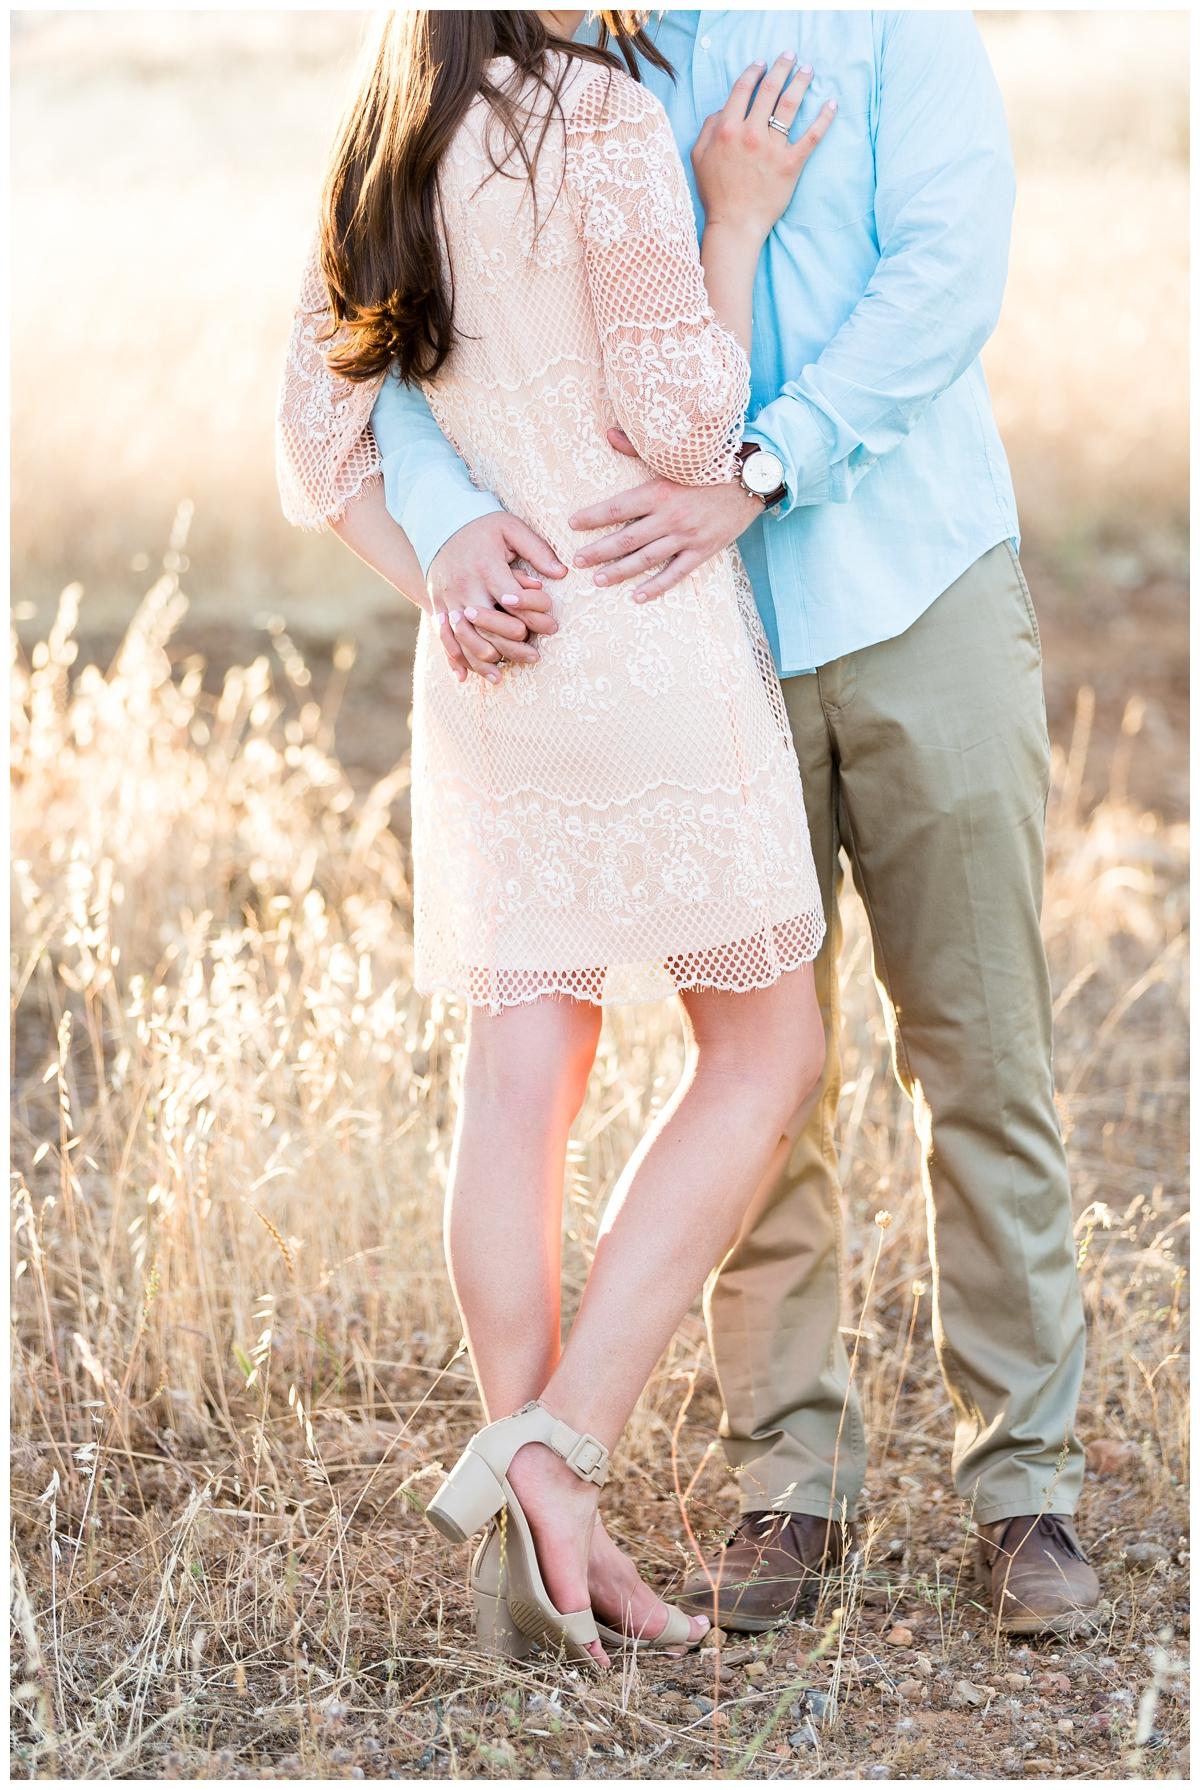 Chico-Engagement-Photographer-Highway-99_0028-1.jpg